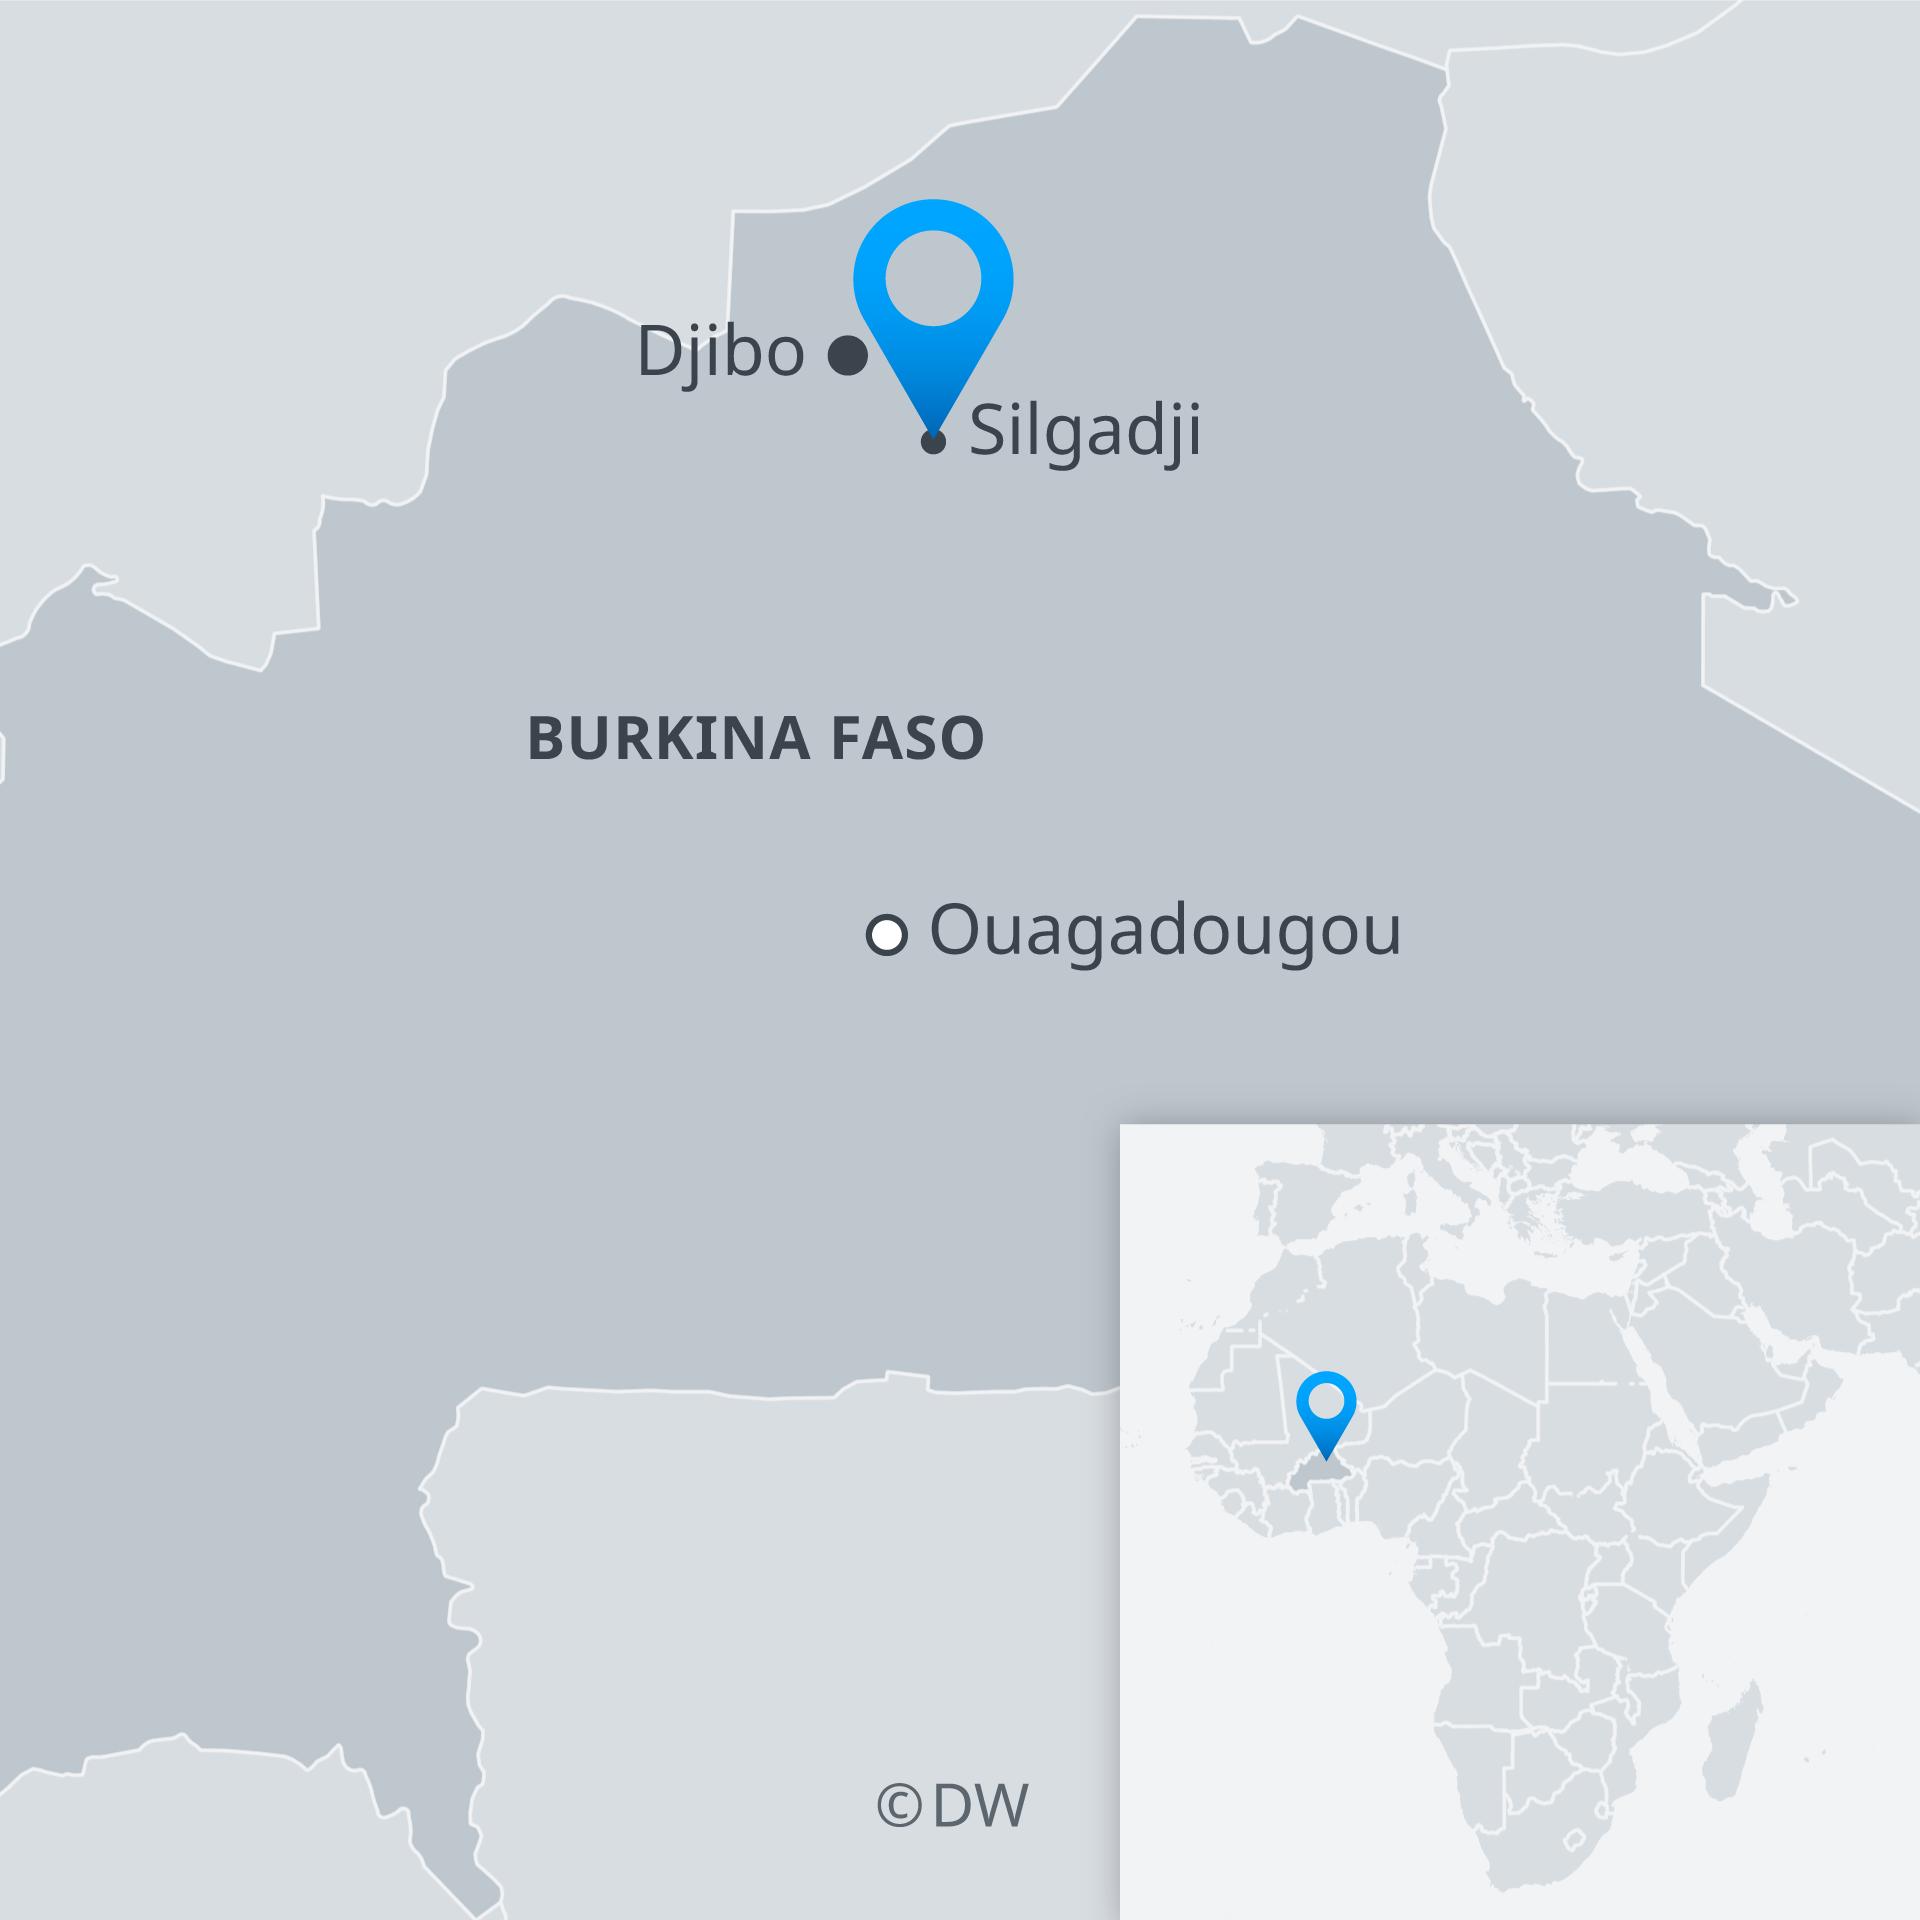 Infografik Karte Burkina Faso mit Ouagadougou, Djibo, Silgadji